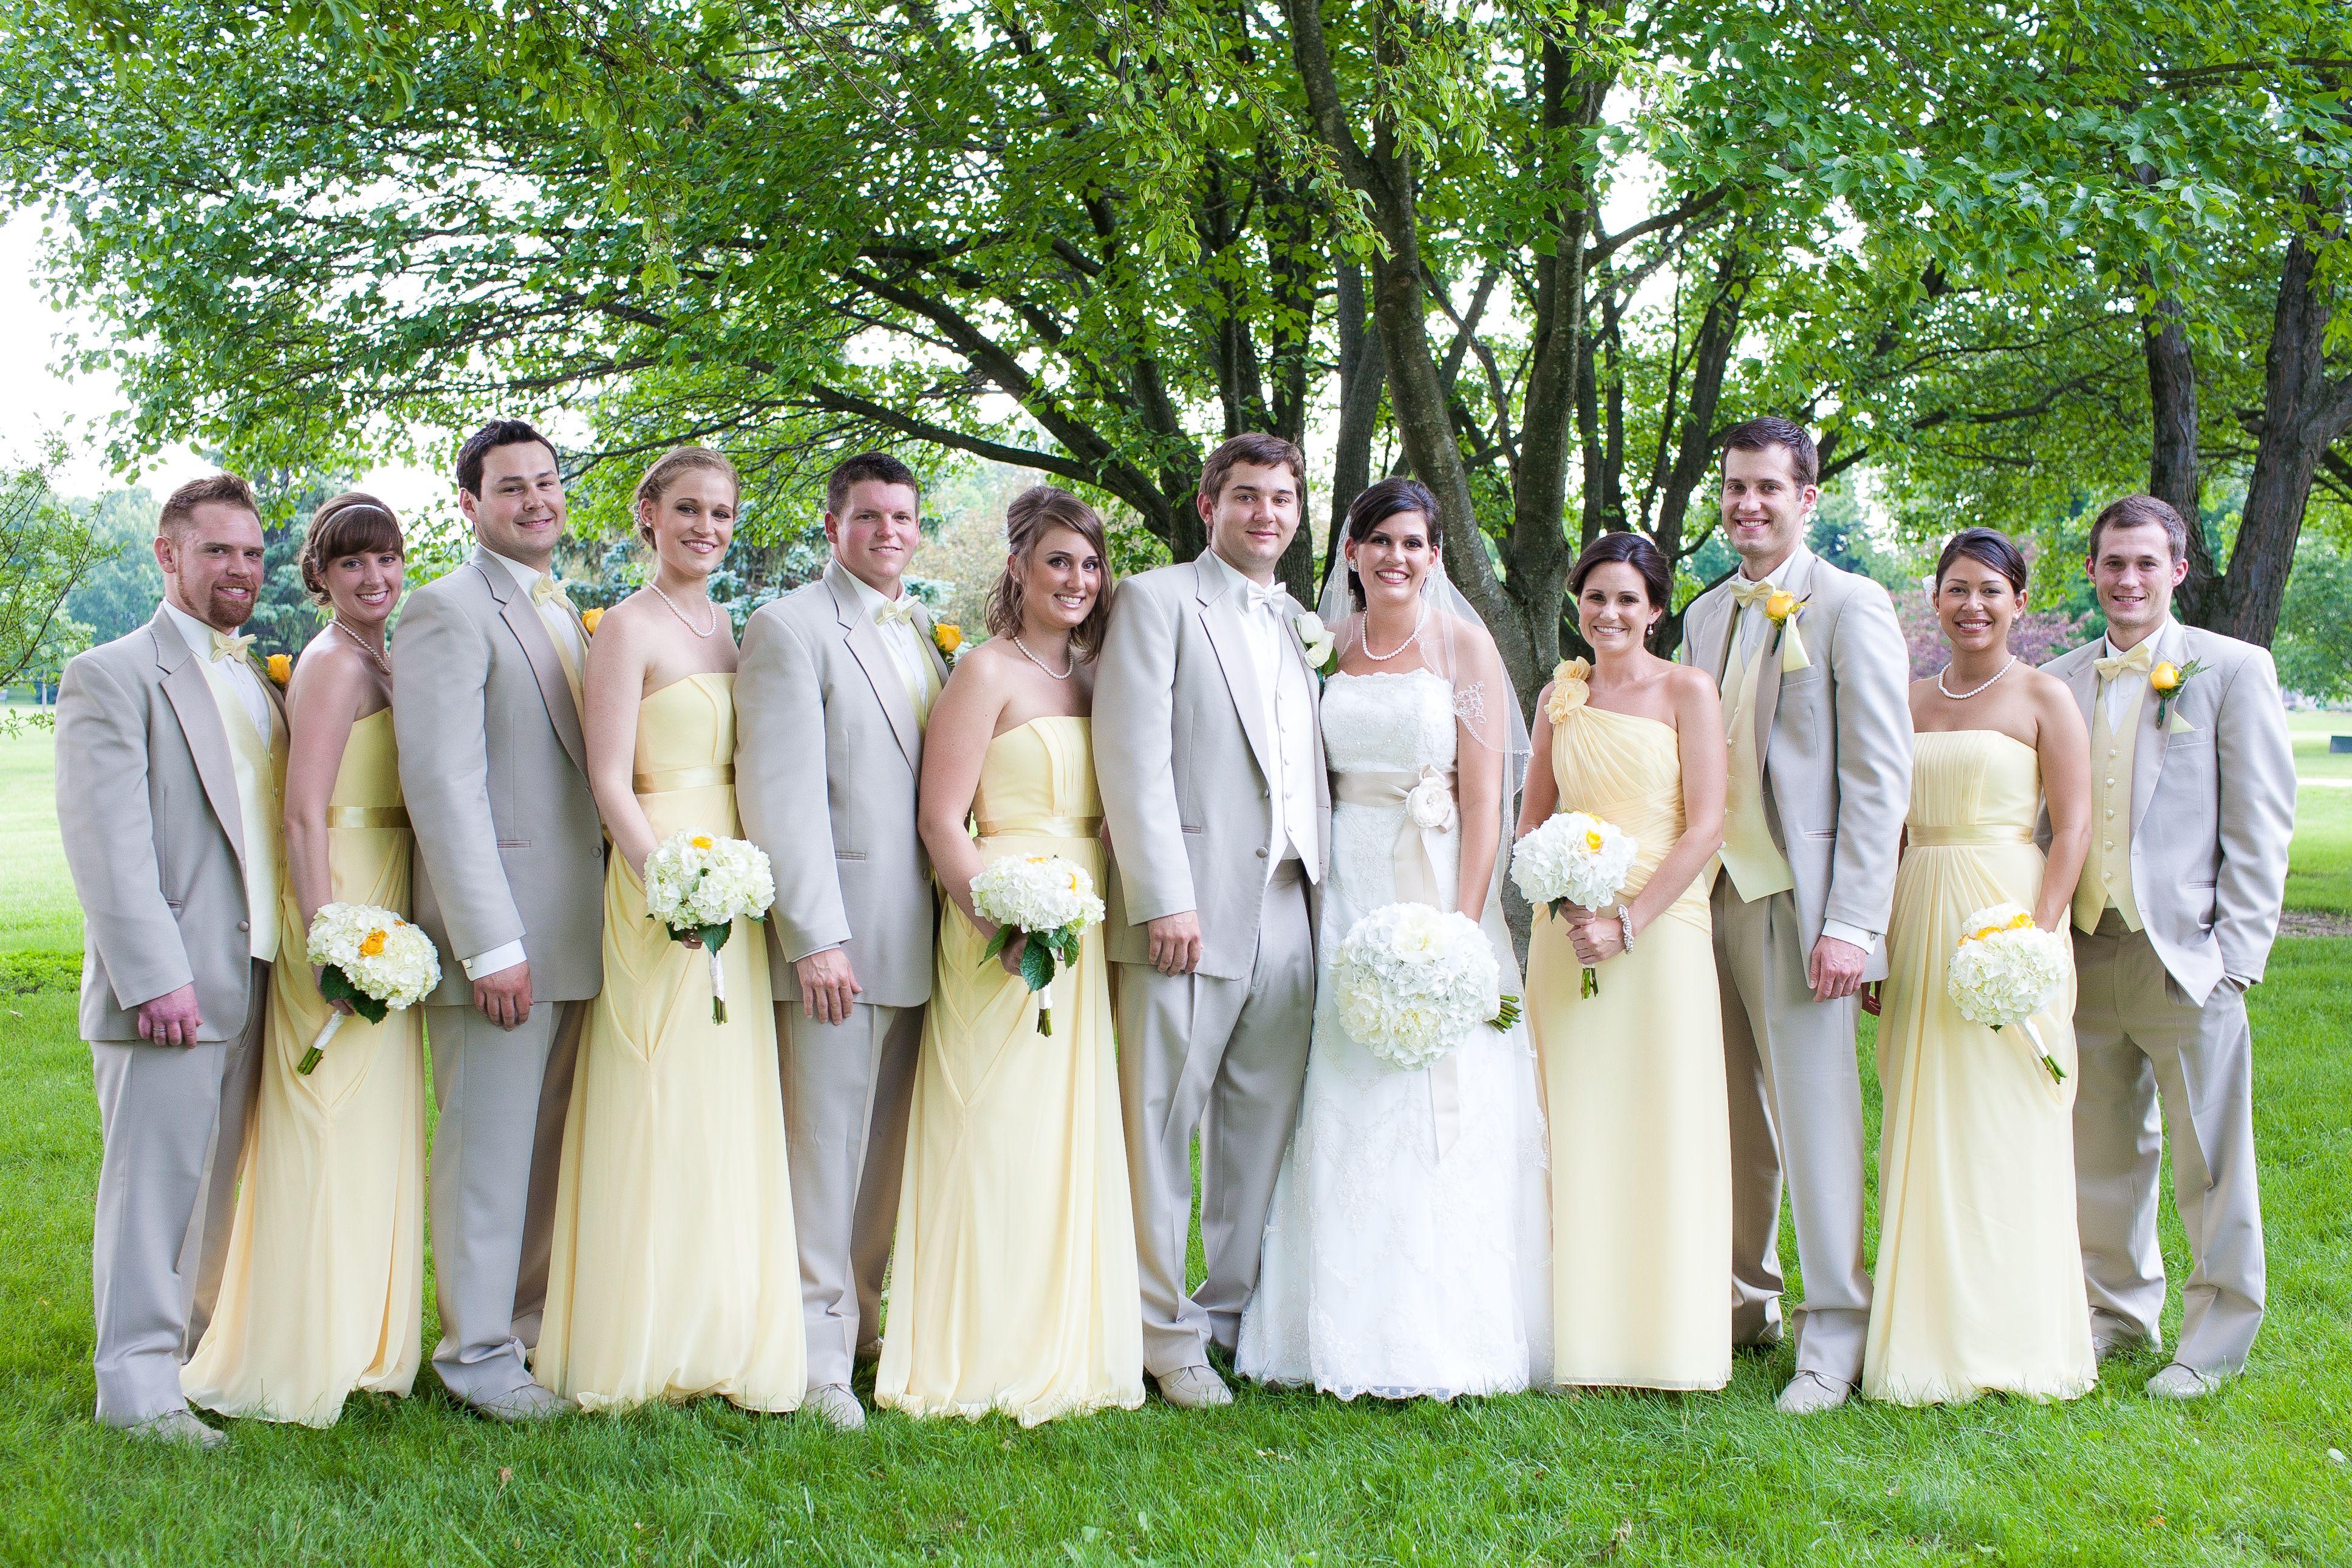 Wedding Party Yellow Tan